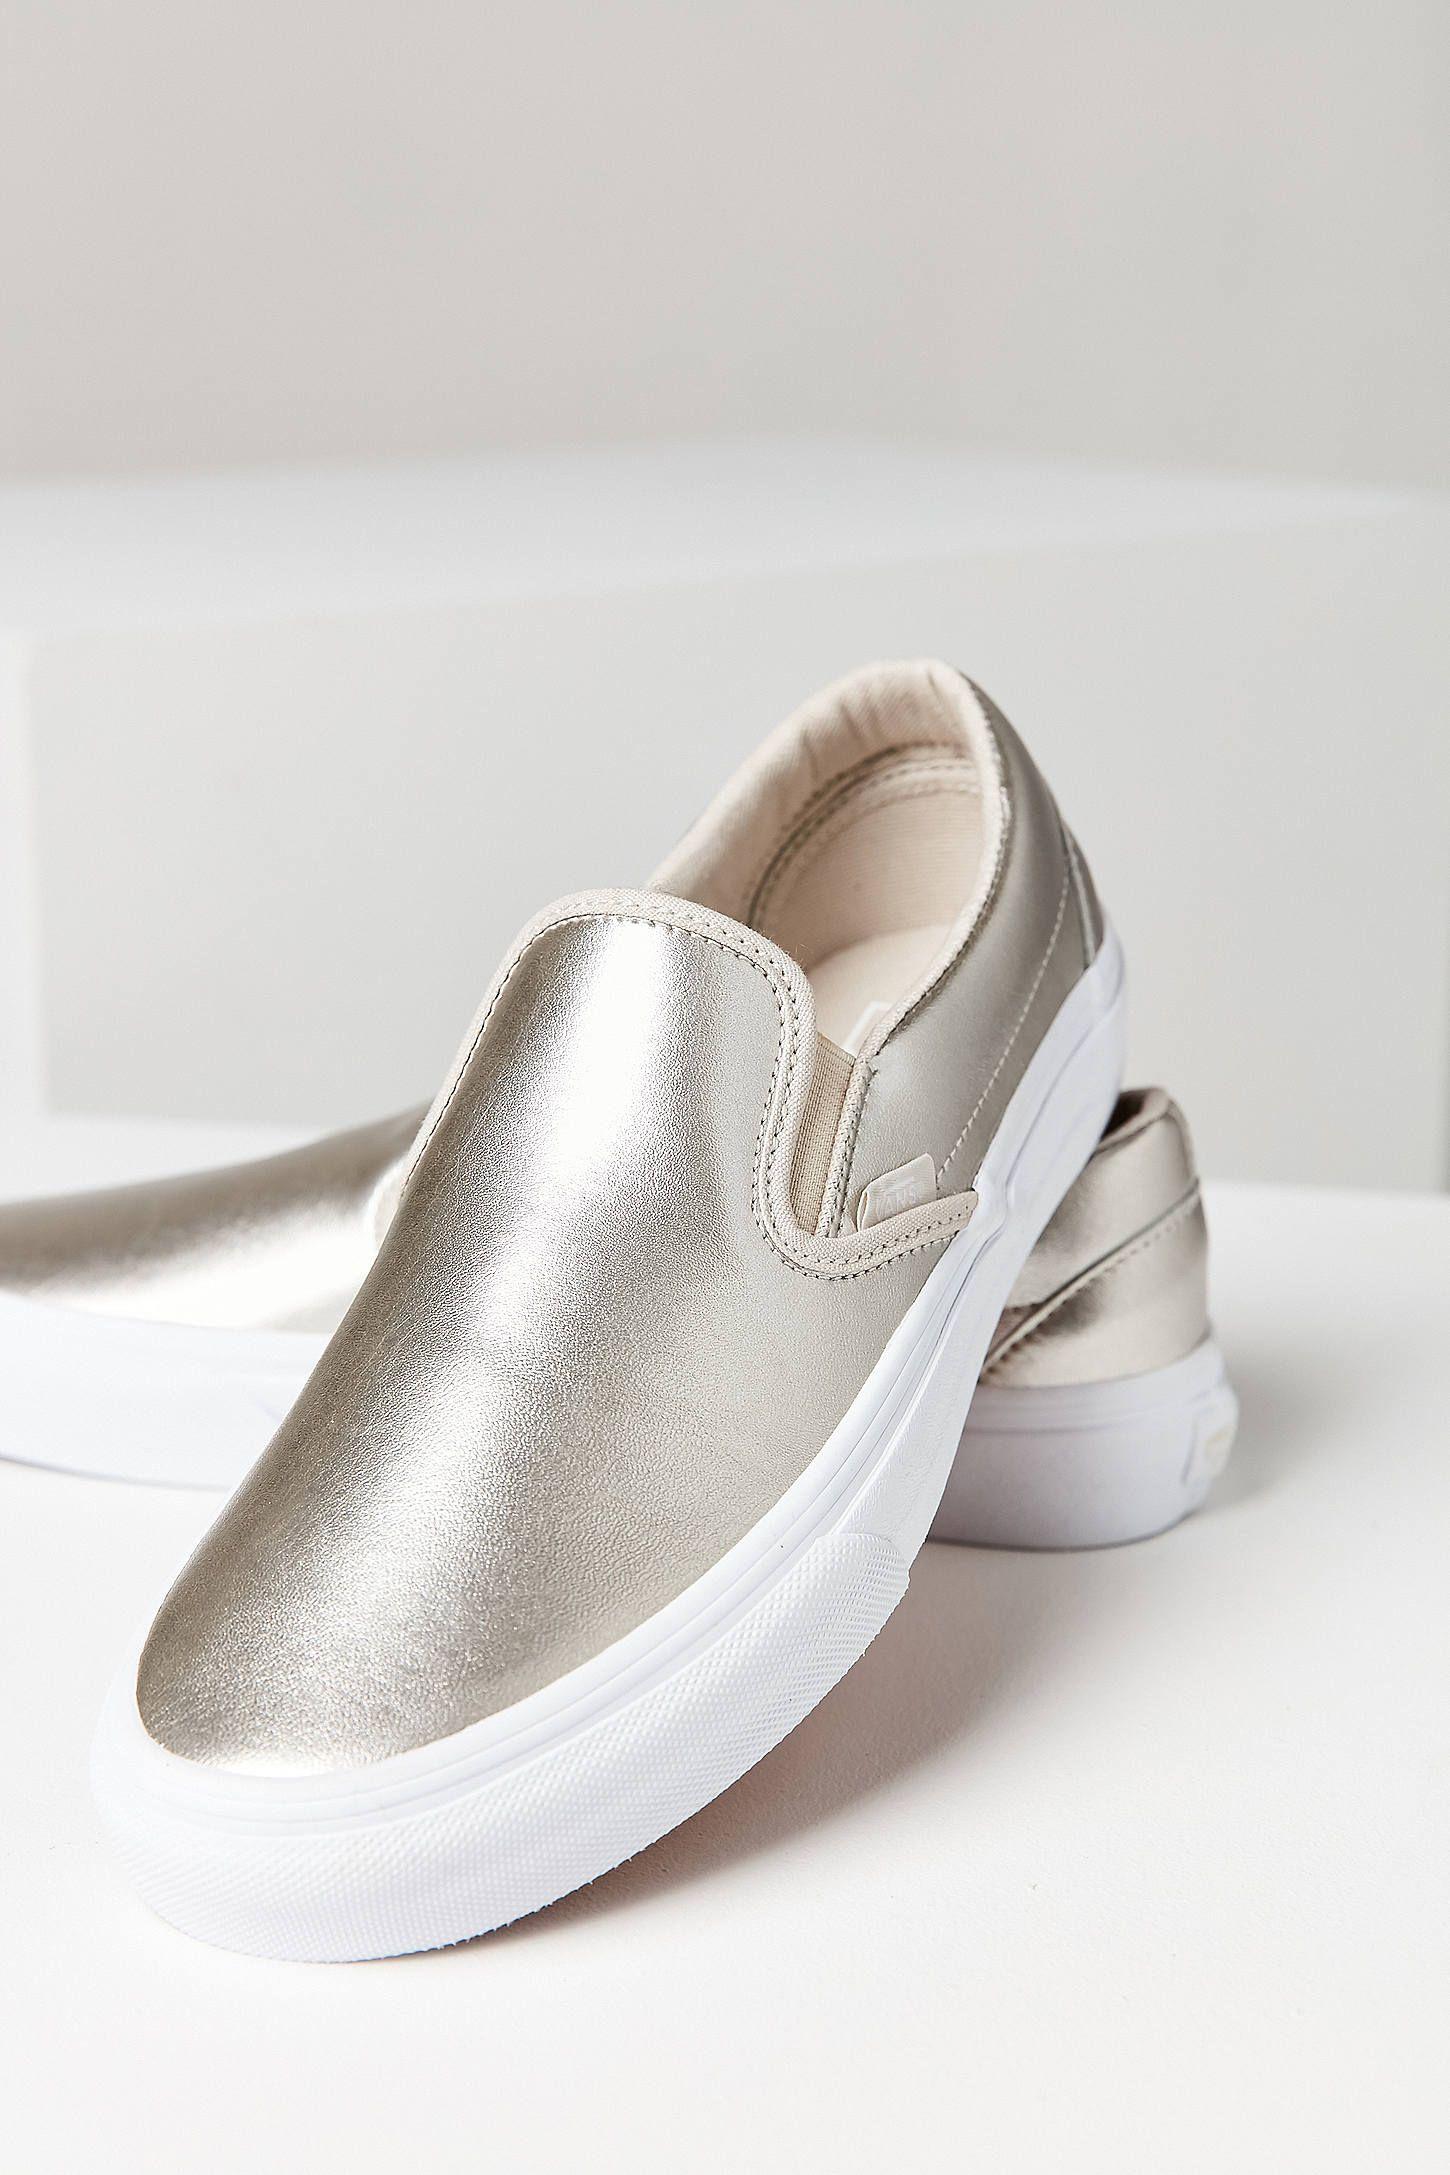 Vans Silver Metallic Slip-On Sneaker